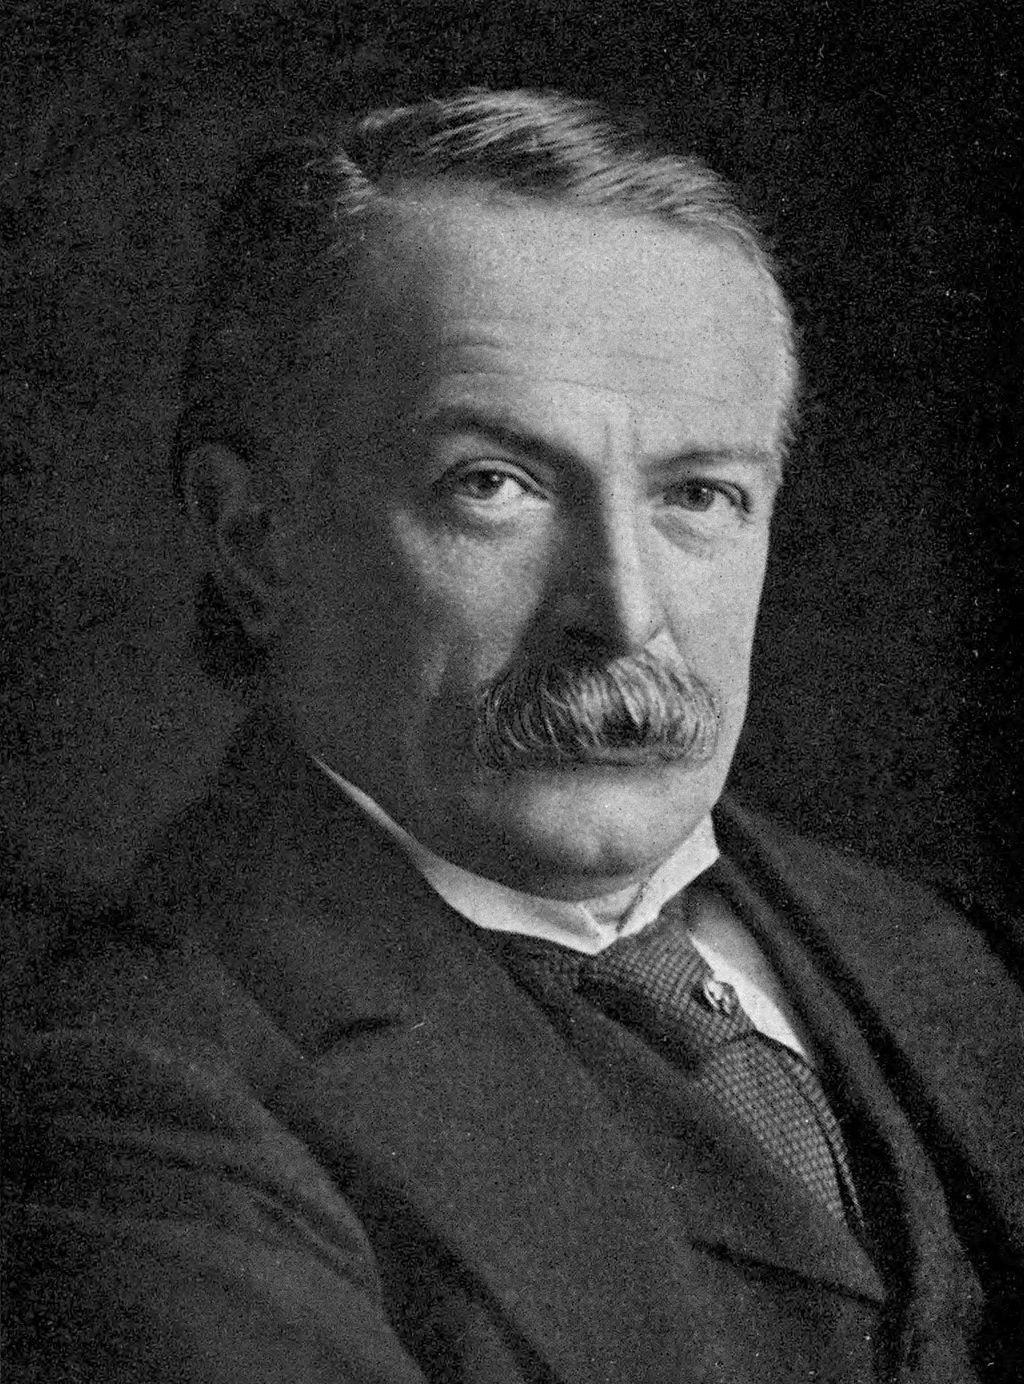 David Lloyd George circa 1918 (Wikimedia)